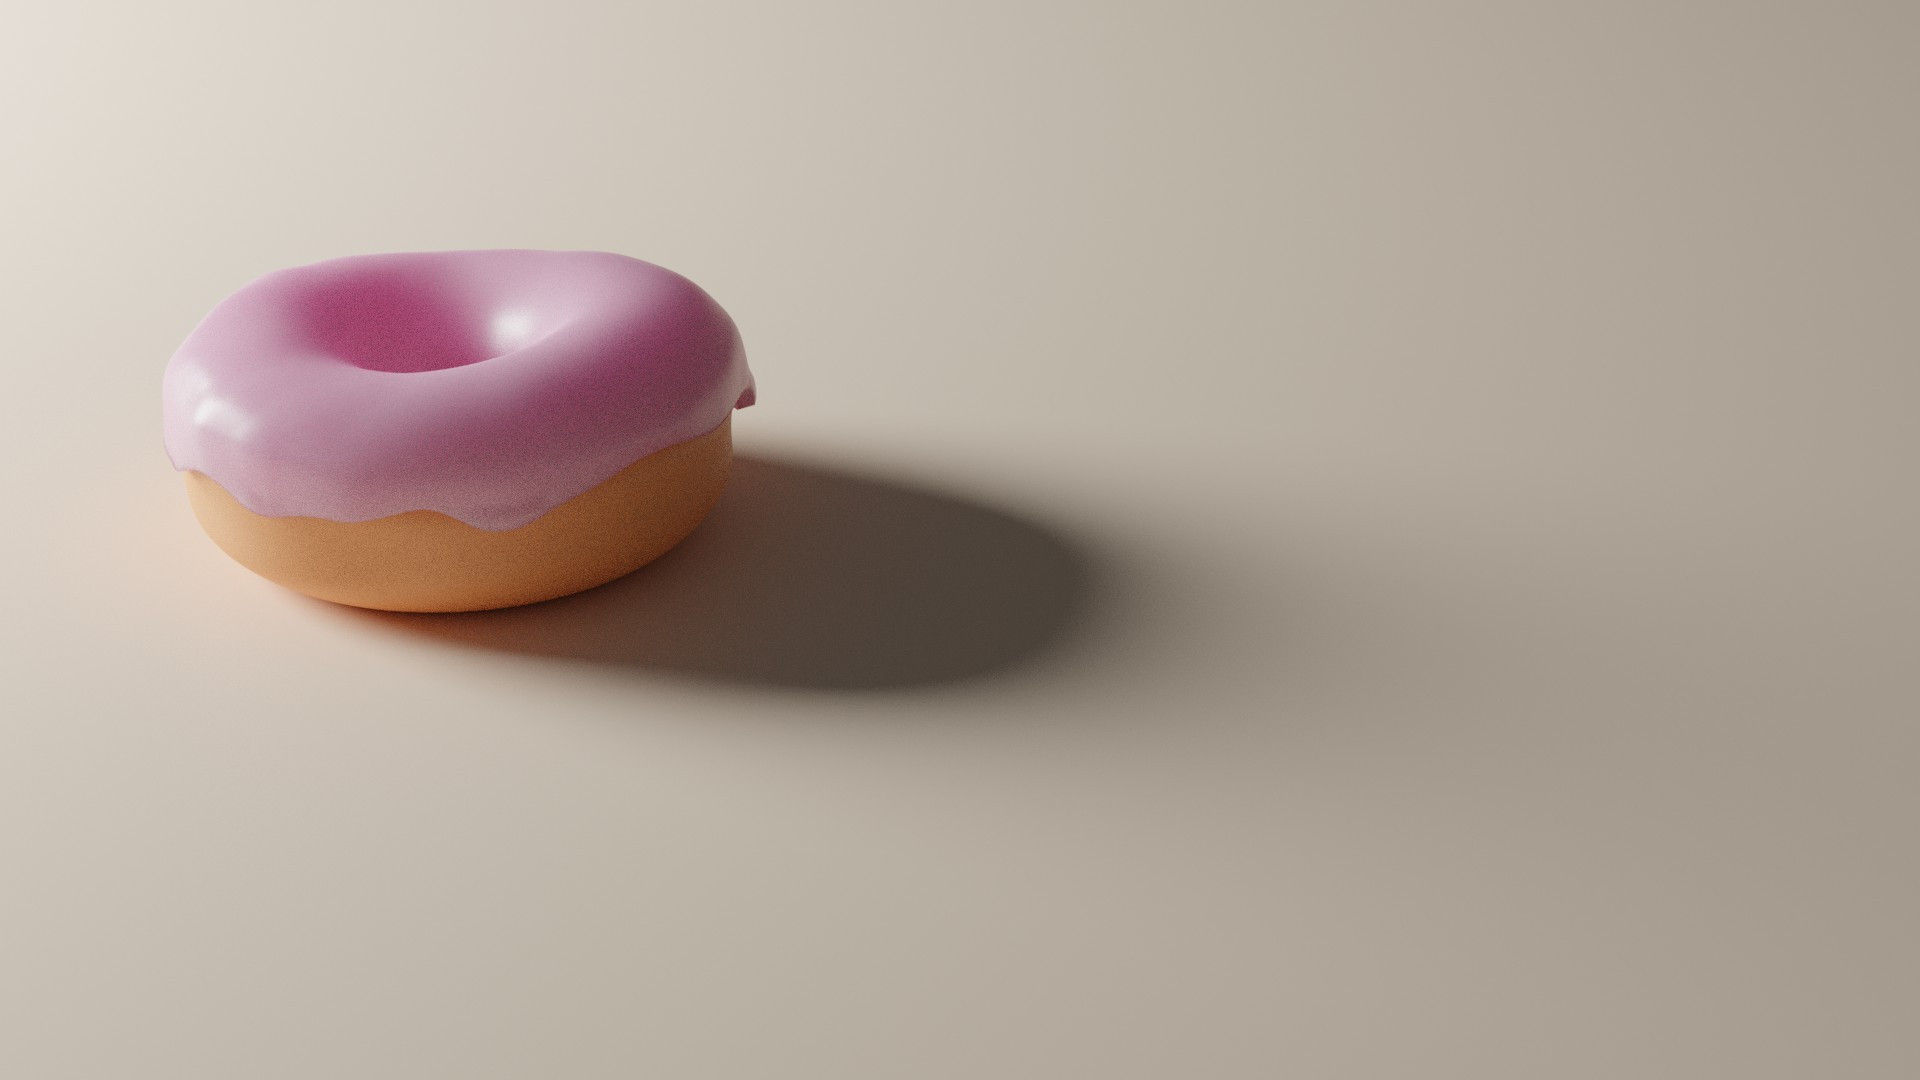 3 - Donut  - Second Render